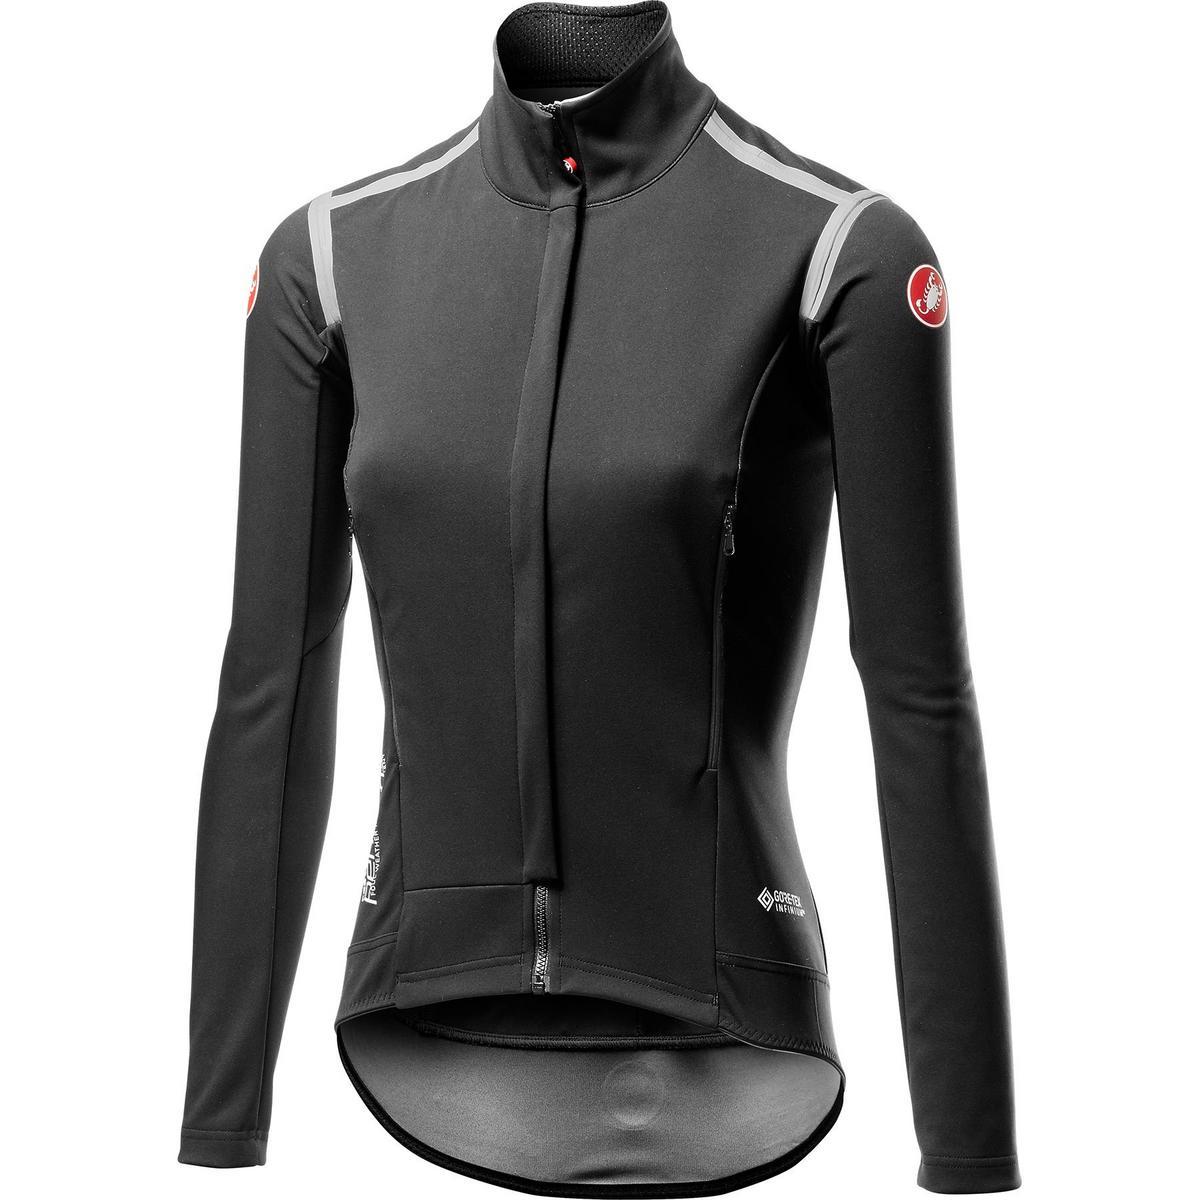 Castelli Women's Perfetto RoS Jacket - Black